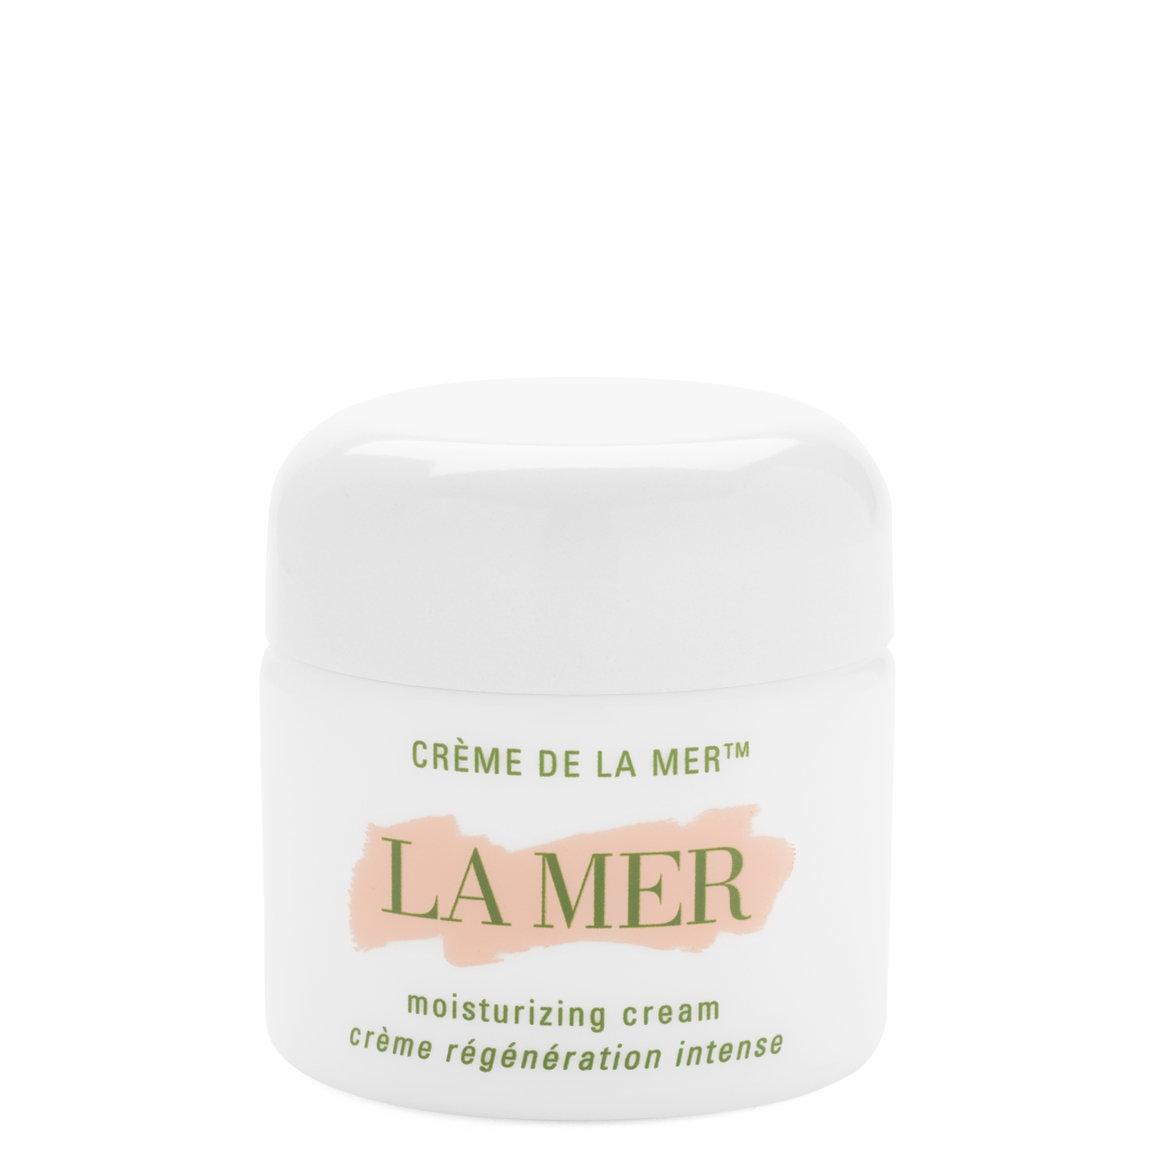 La Mer Crème De La Mer 2 oz alternative view 1 - product swatch.